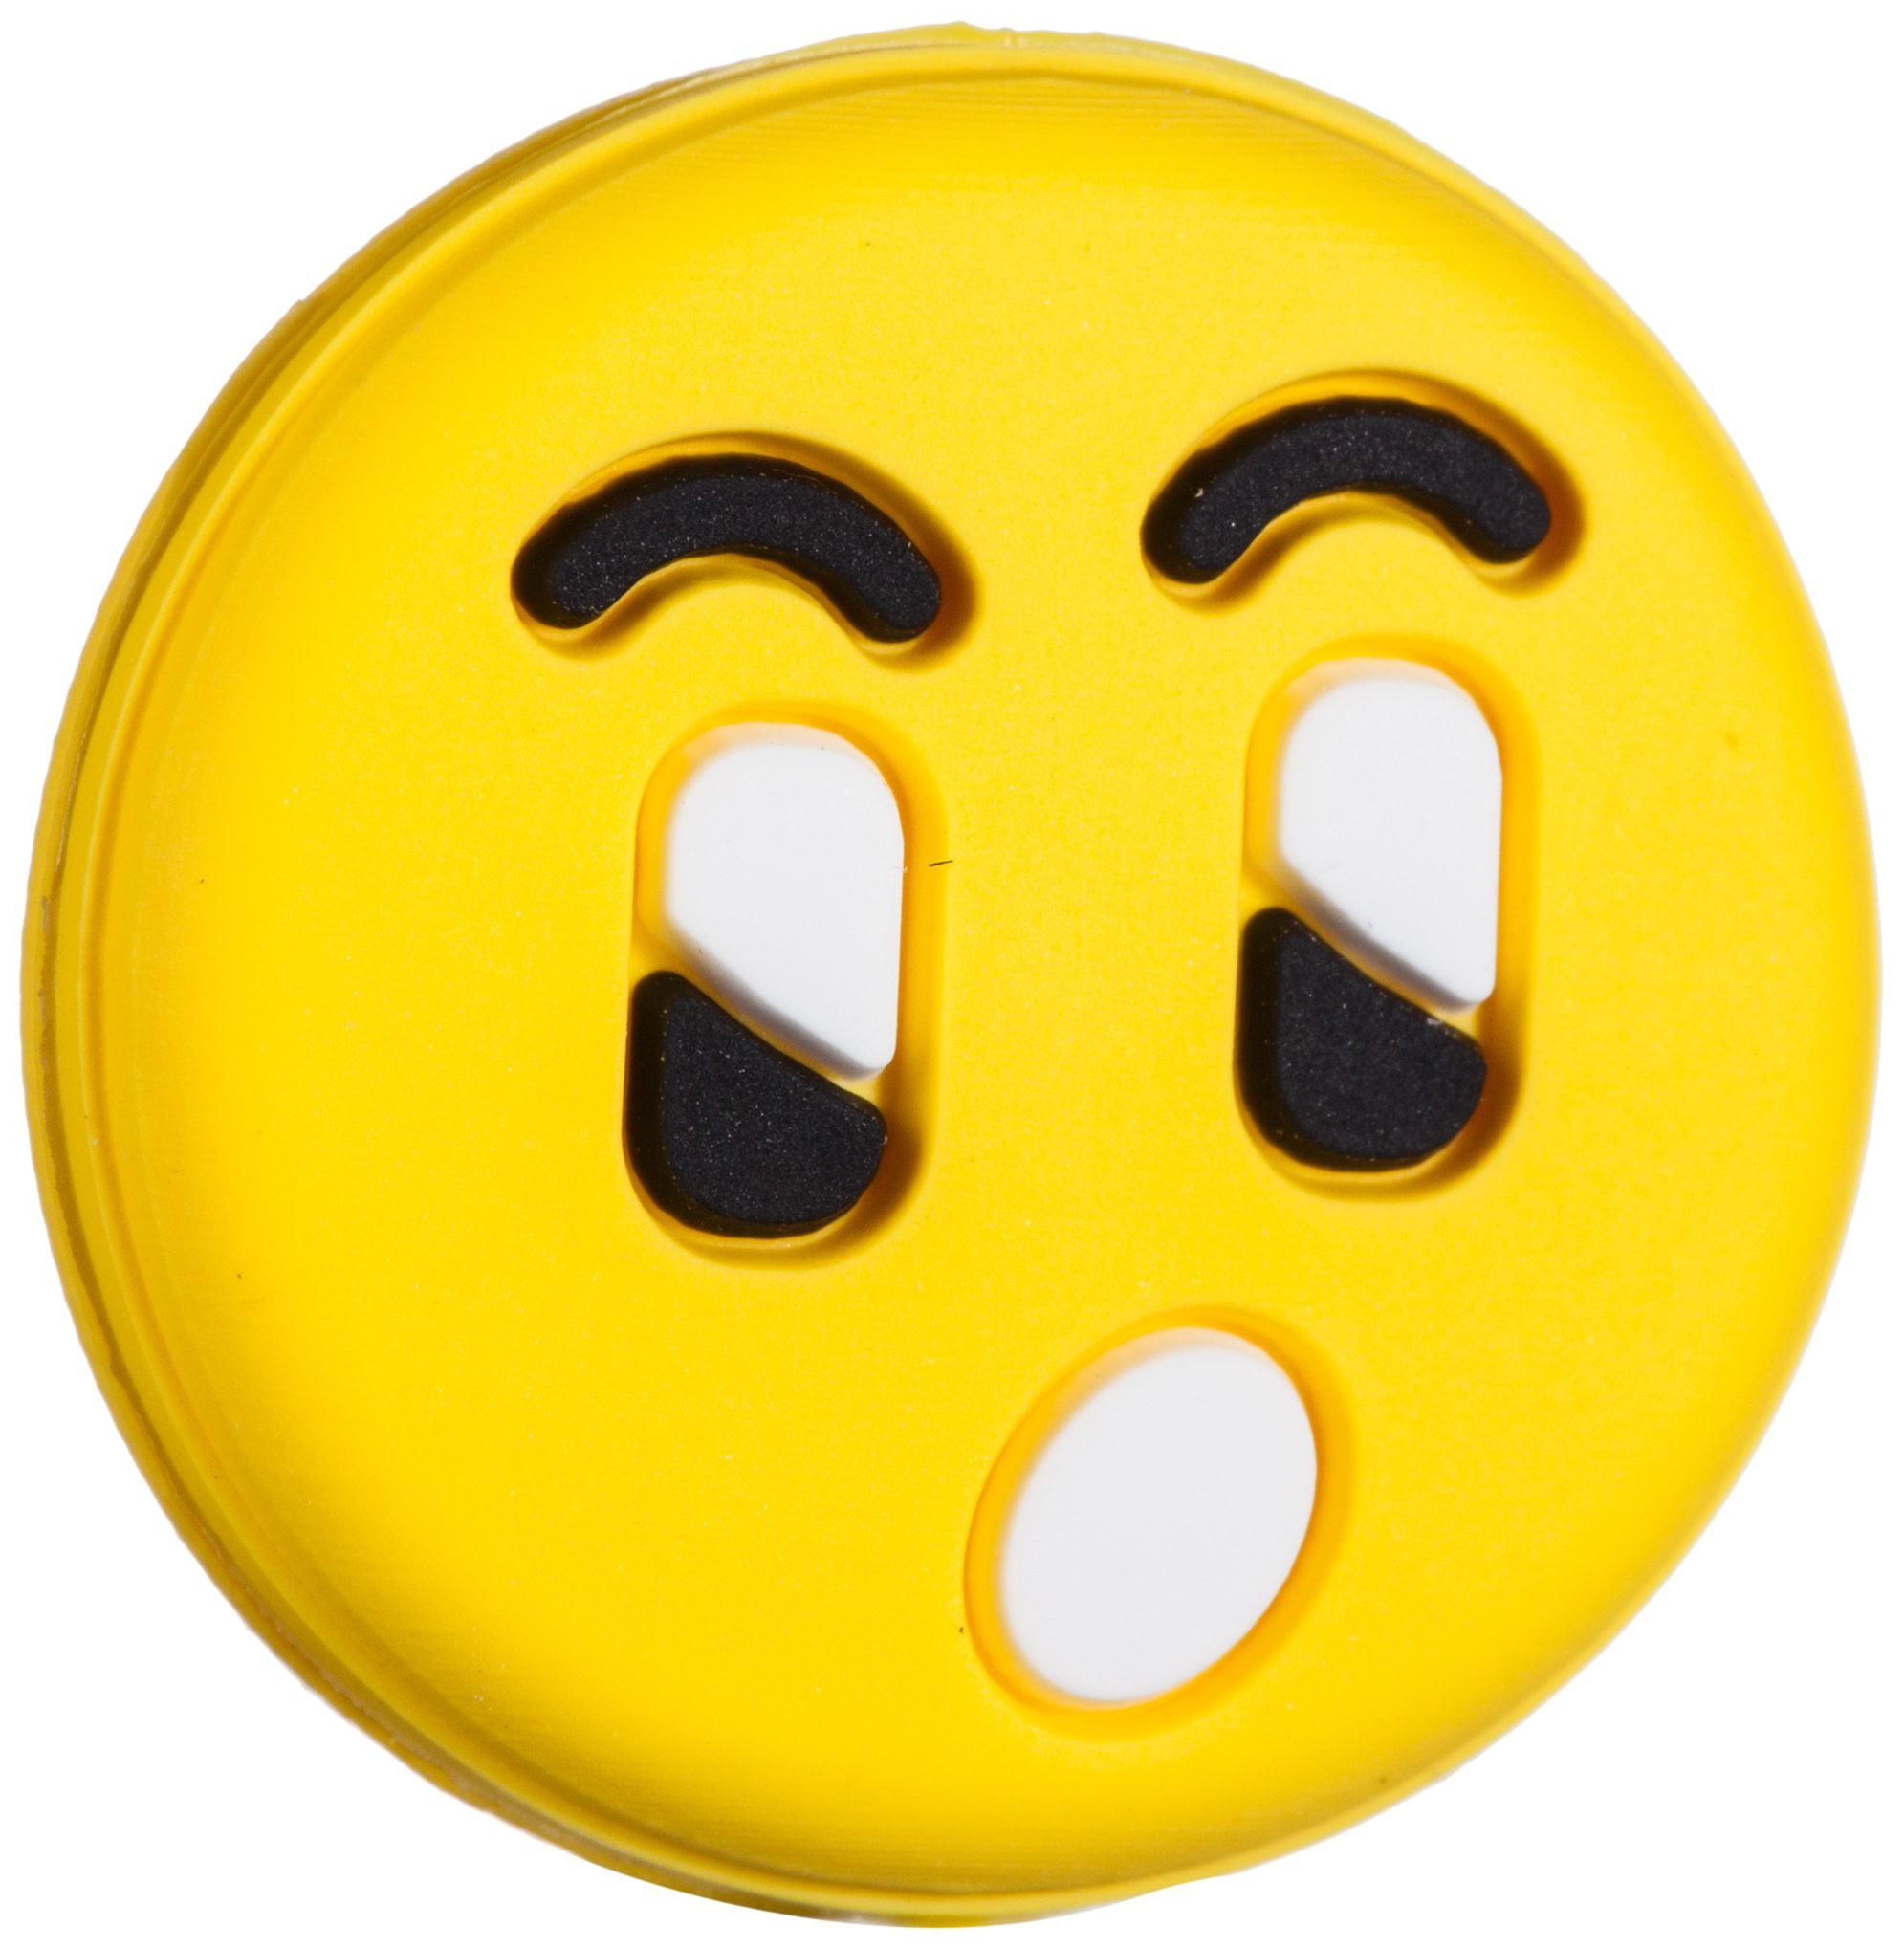 Wilson Emotisorbs Single Pack (High Eyebrow Face)